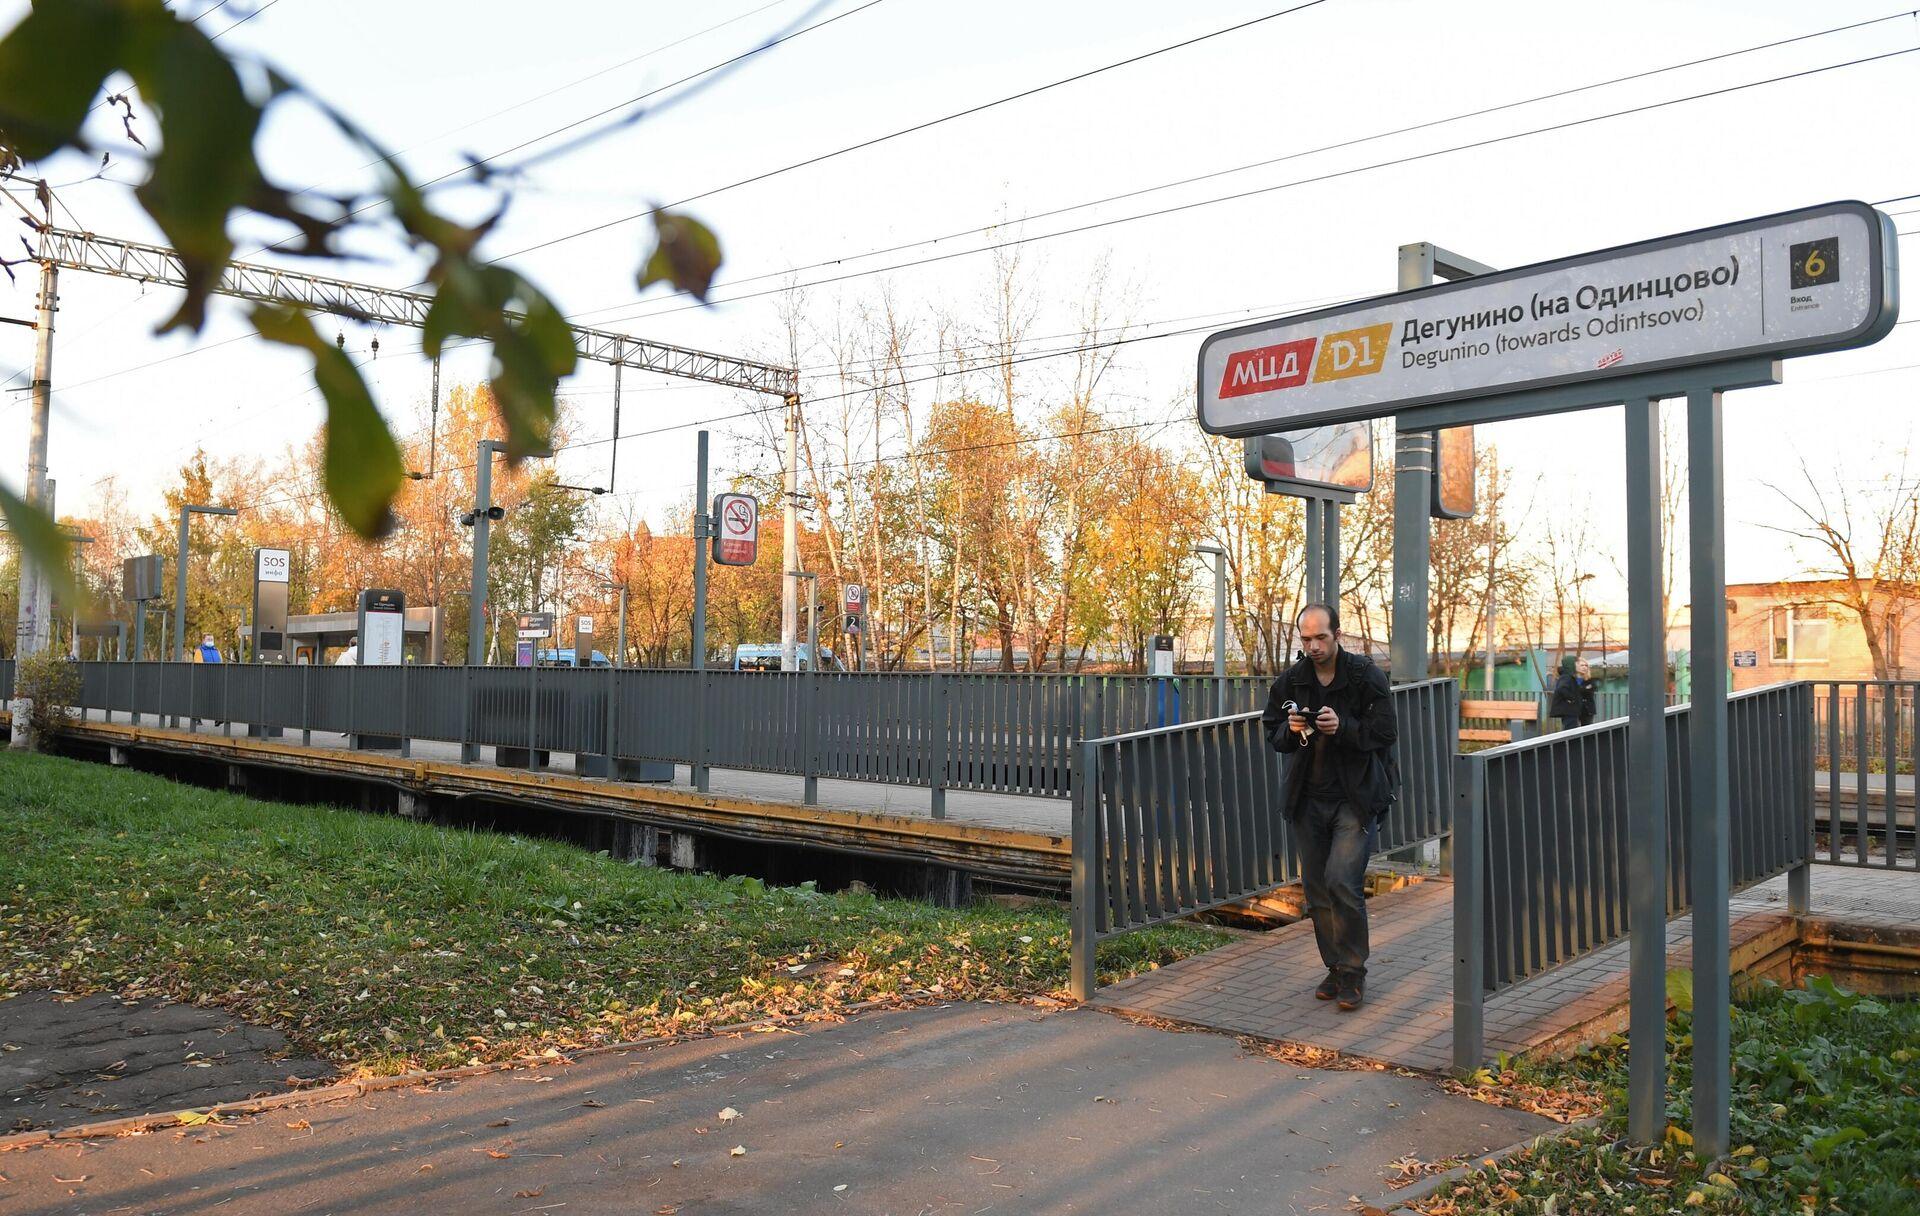 Мужчина на станции МЦД Дегунино в Москве - РИА Новости, 1920, 11.11.2020